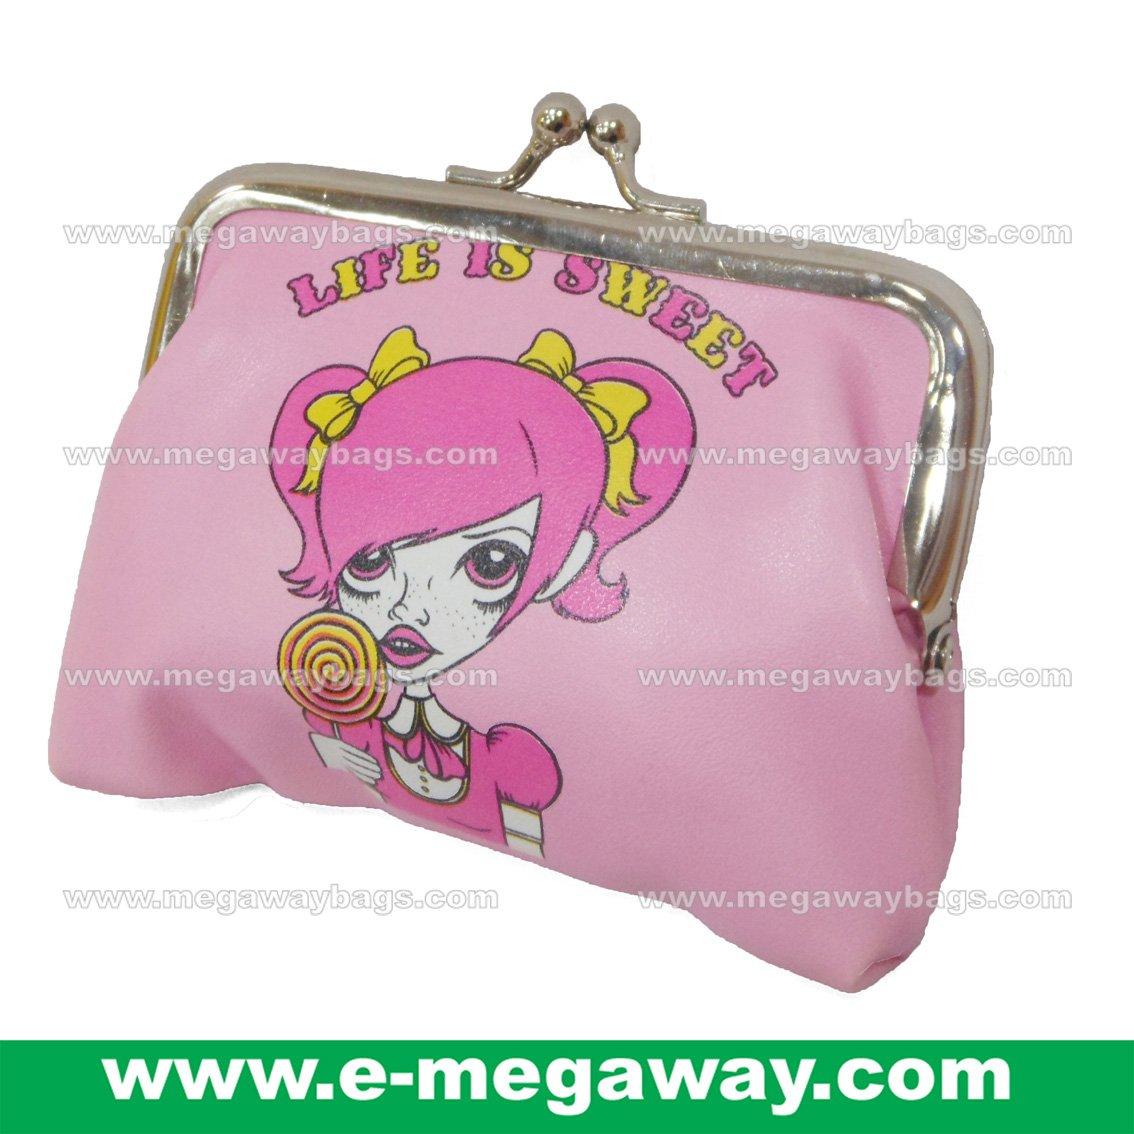 Life is Sweet Clip Purse Bags Wallets Character Print Cartoon Girls MegawayBags #CC-1056